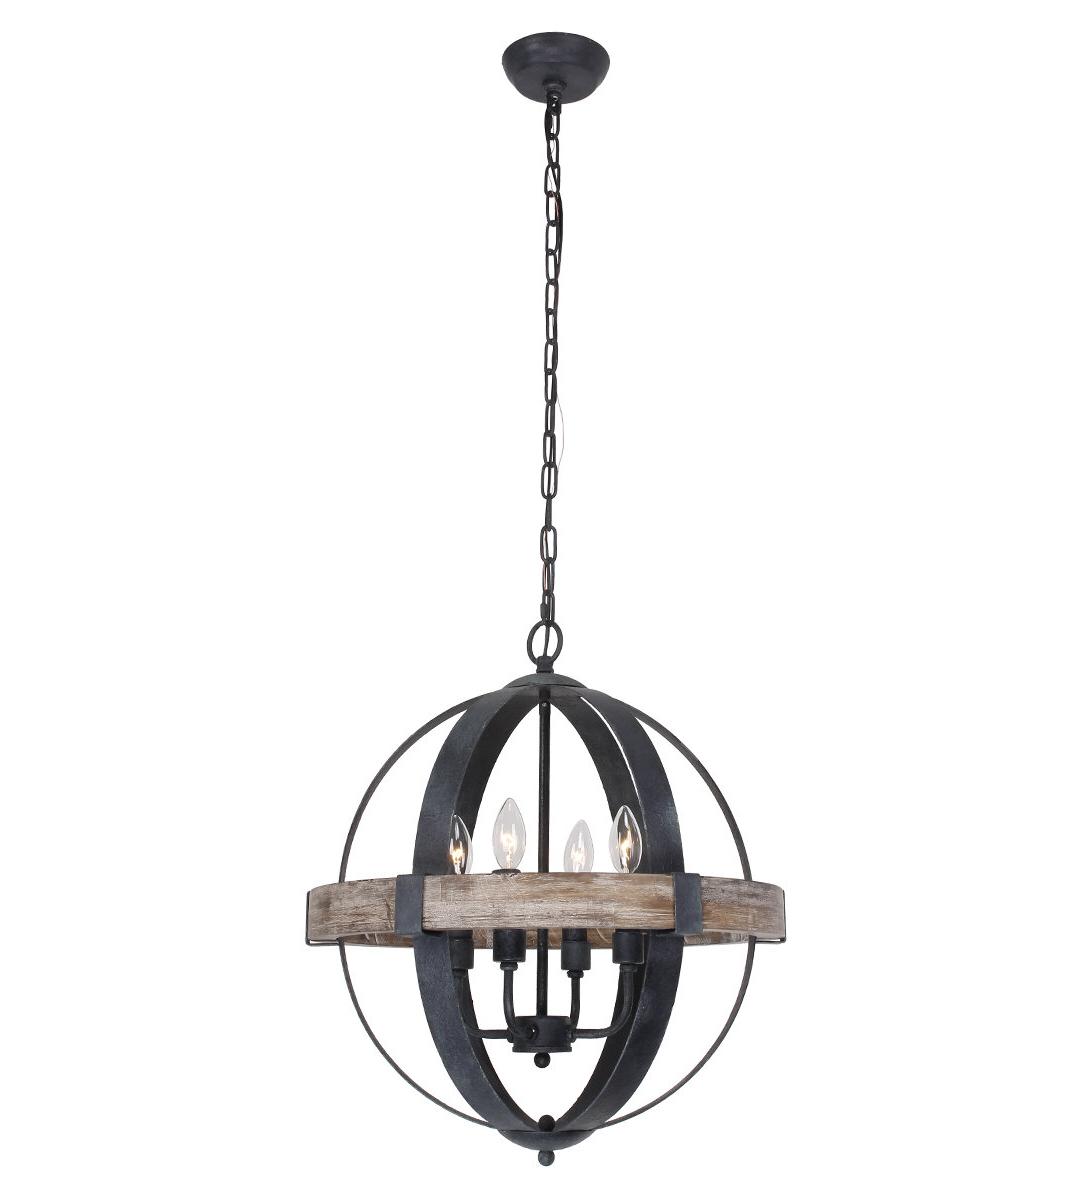 2020 La Sarre 3 Light Globe Chandeliers Regarding Hillsboro 4 Light Globe Chandelier (Gallery 10 of 20)